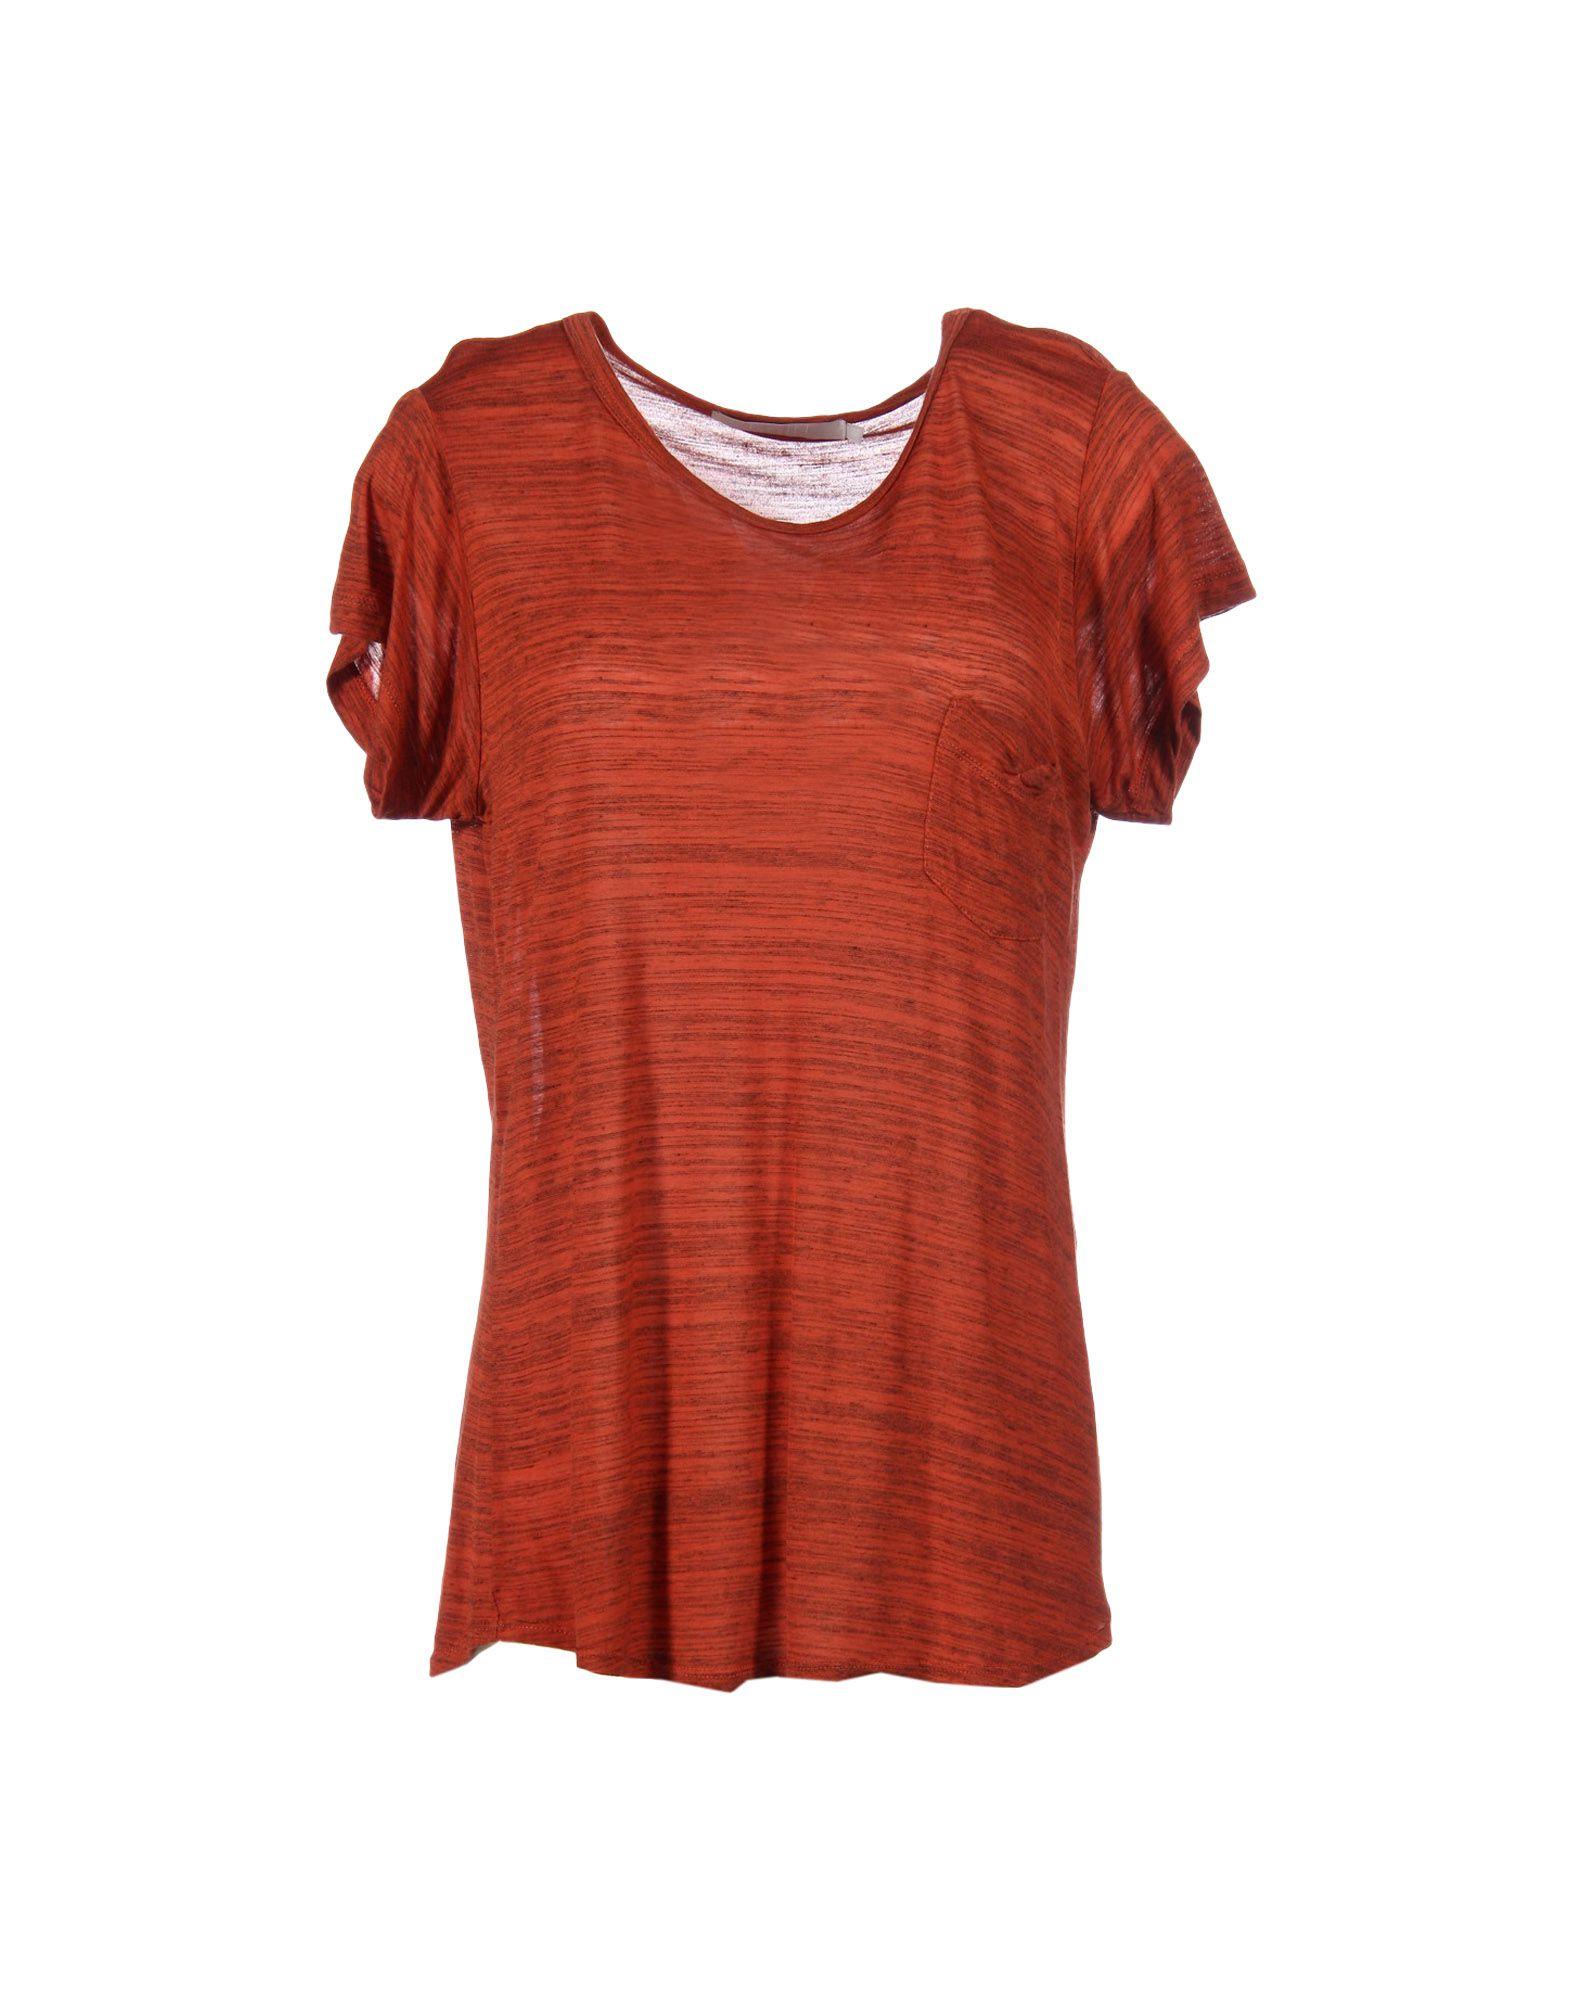 KAIN T-Shirt in Orange